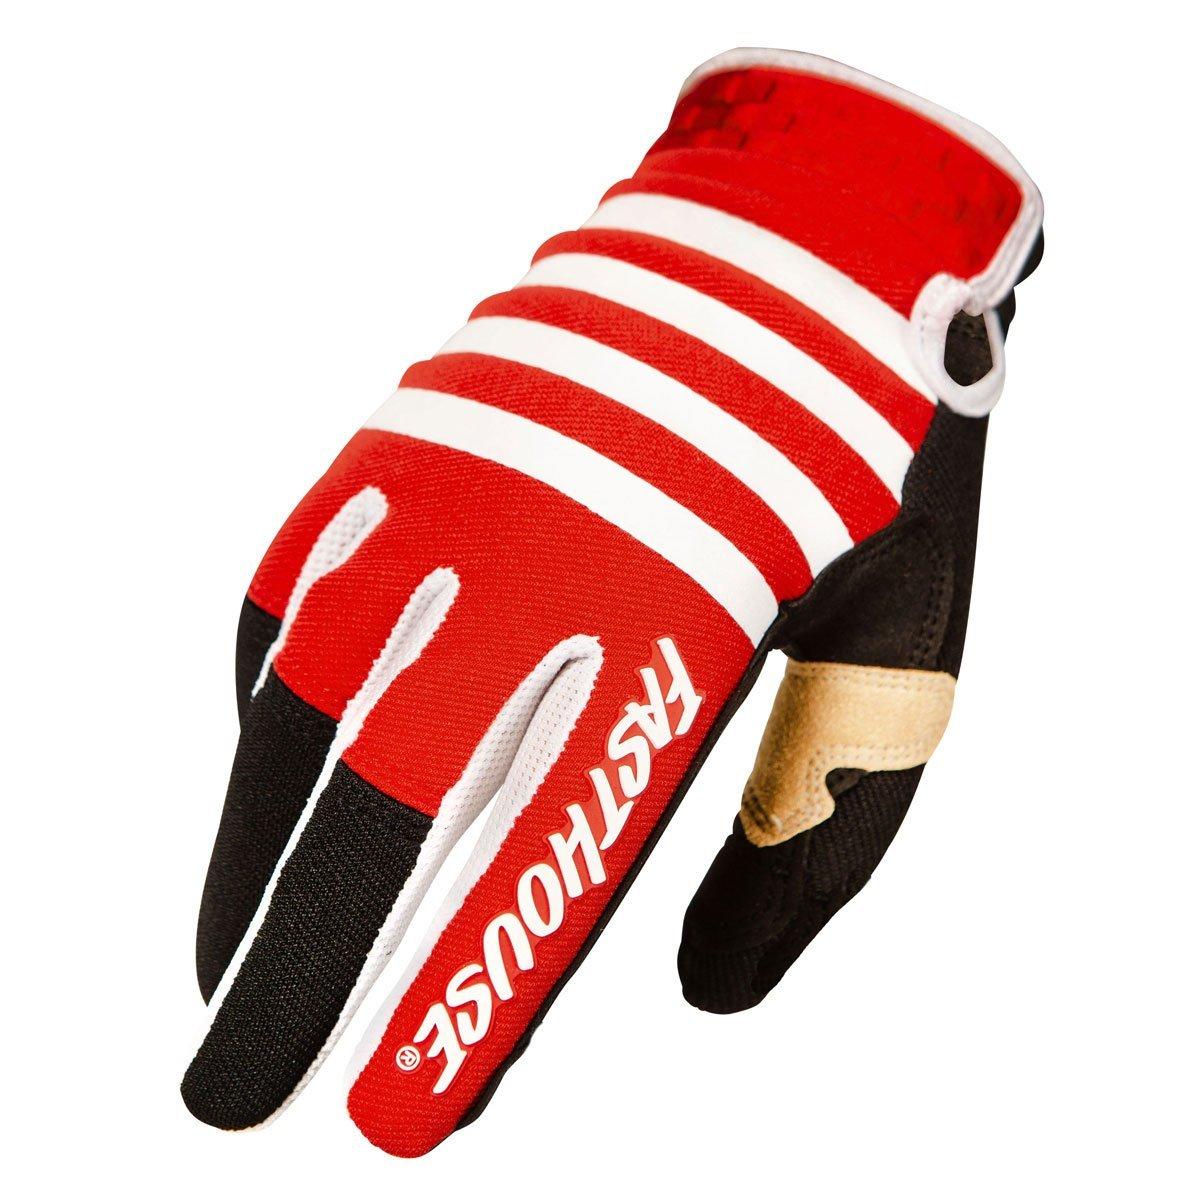 Fasthouse Speed Style Striper Bike Glove